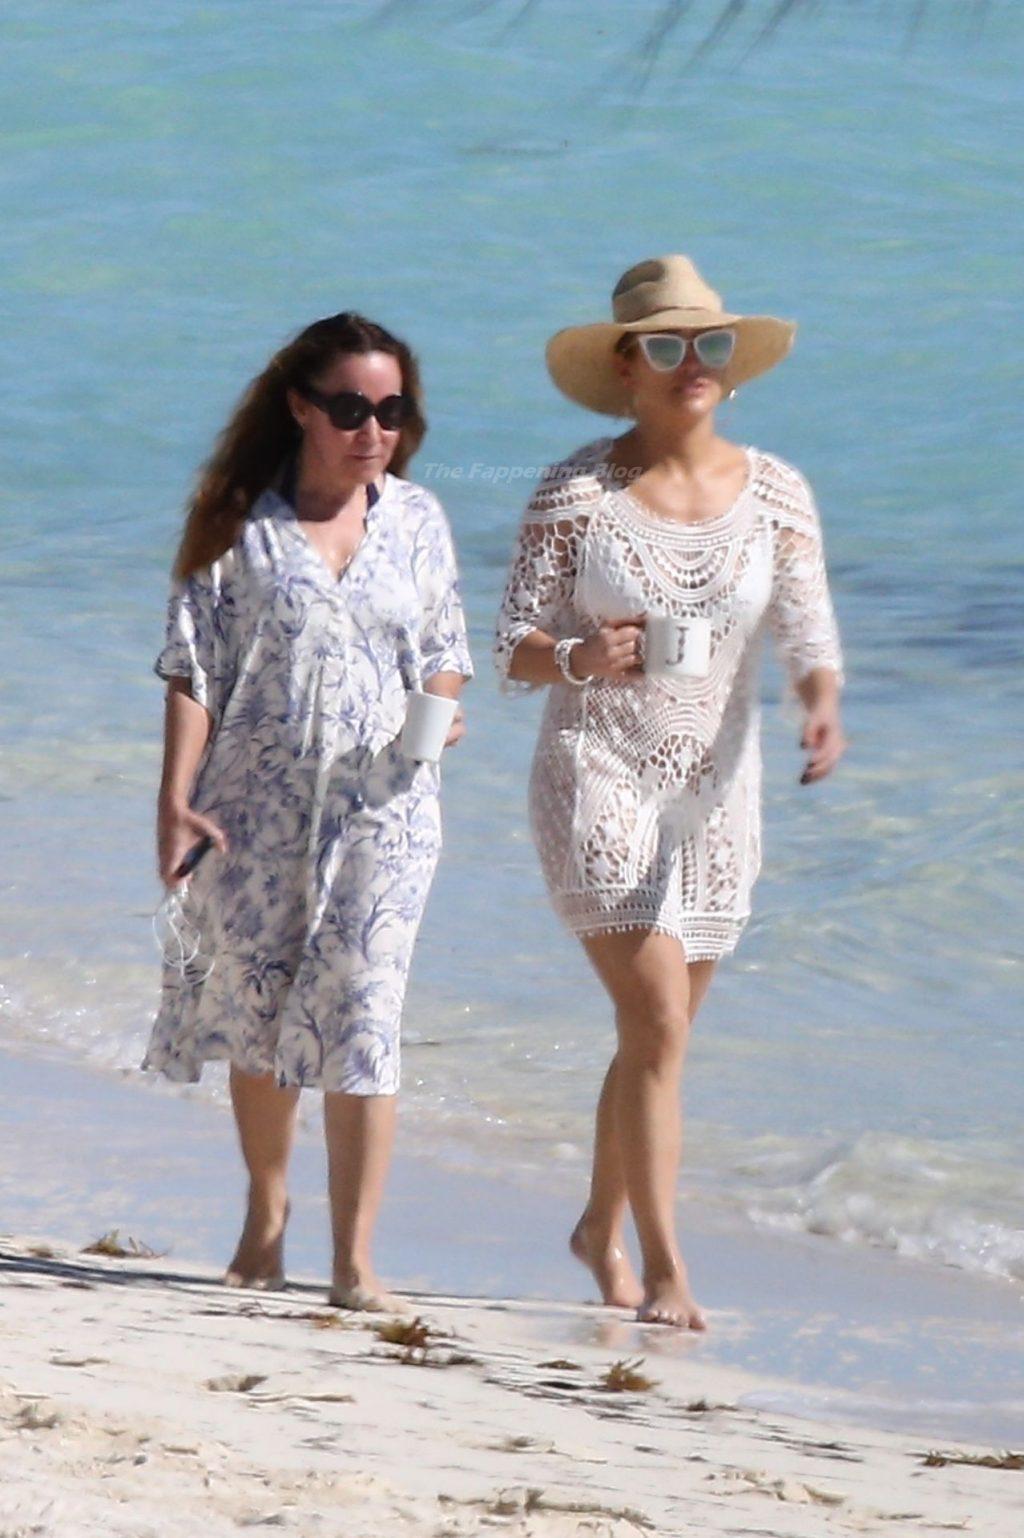 Jennifer Lopez Stuns in a Cheeky White Bikini on the Beach in the Turks and Caicos Islands (43 Photos)